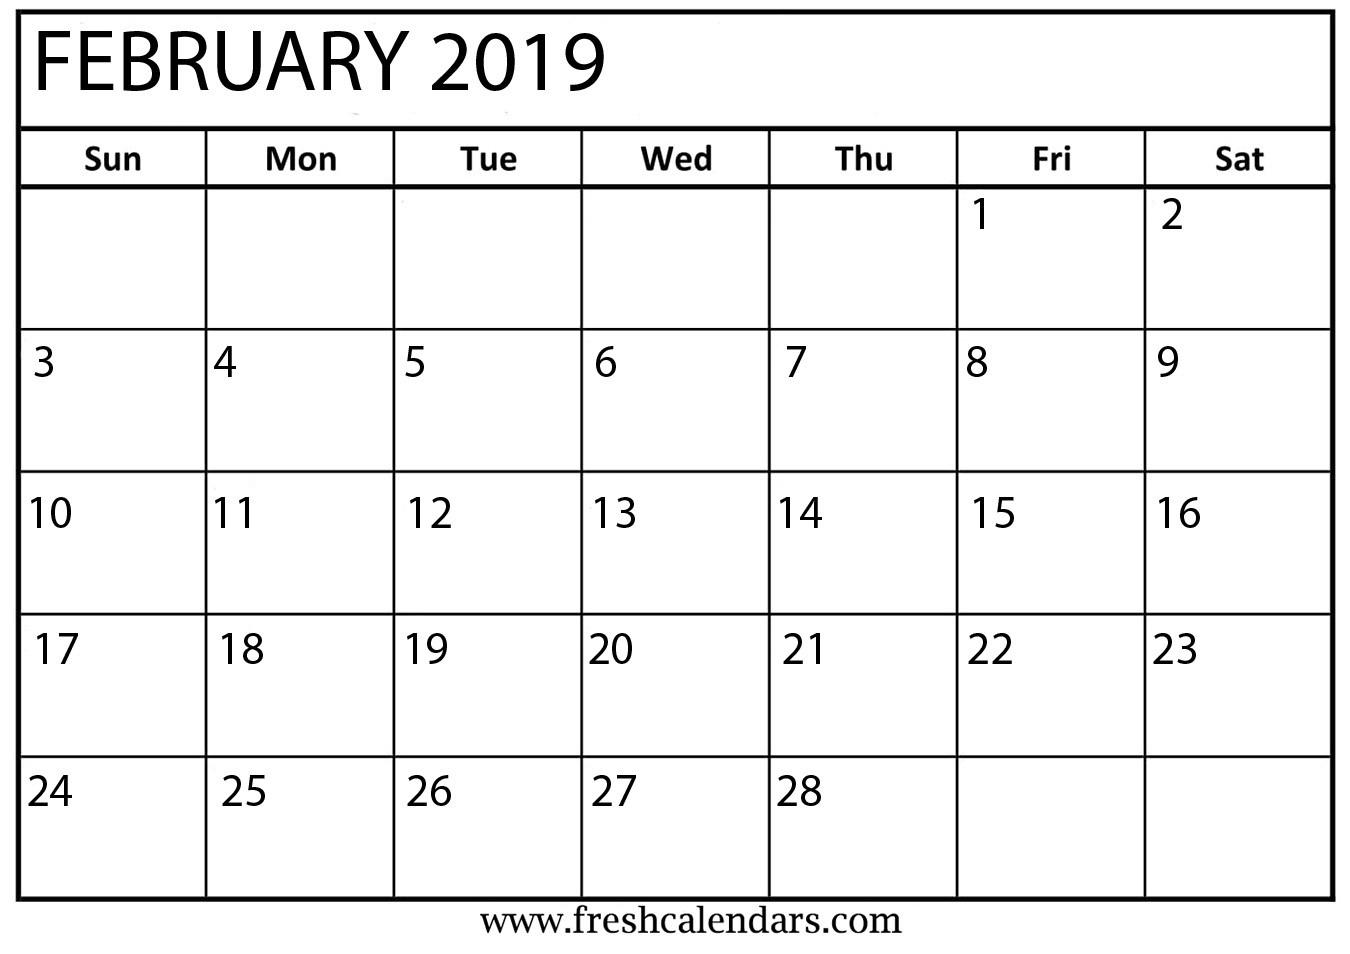 Printable February 2019 Calendar Fresh Calendars